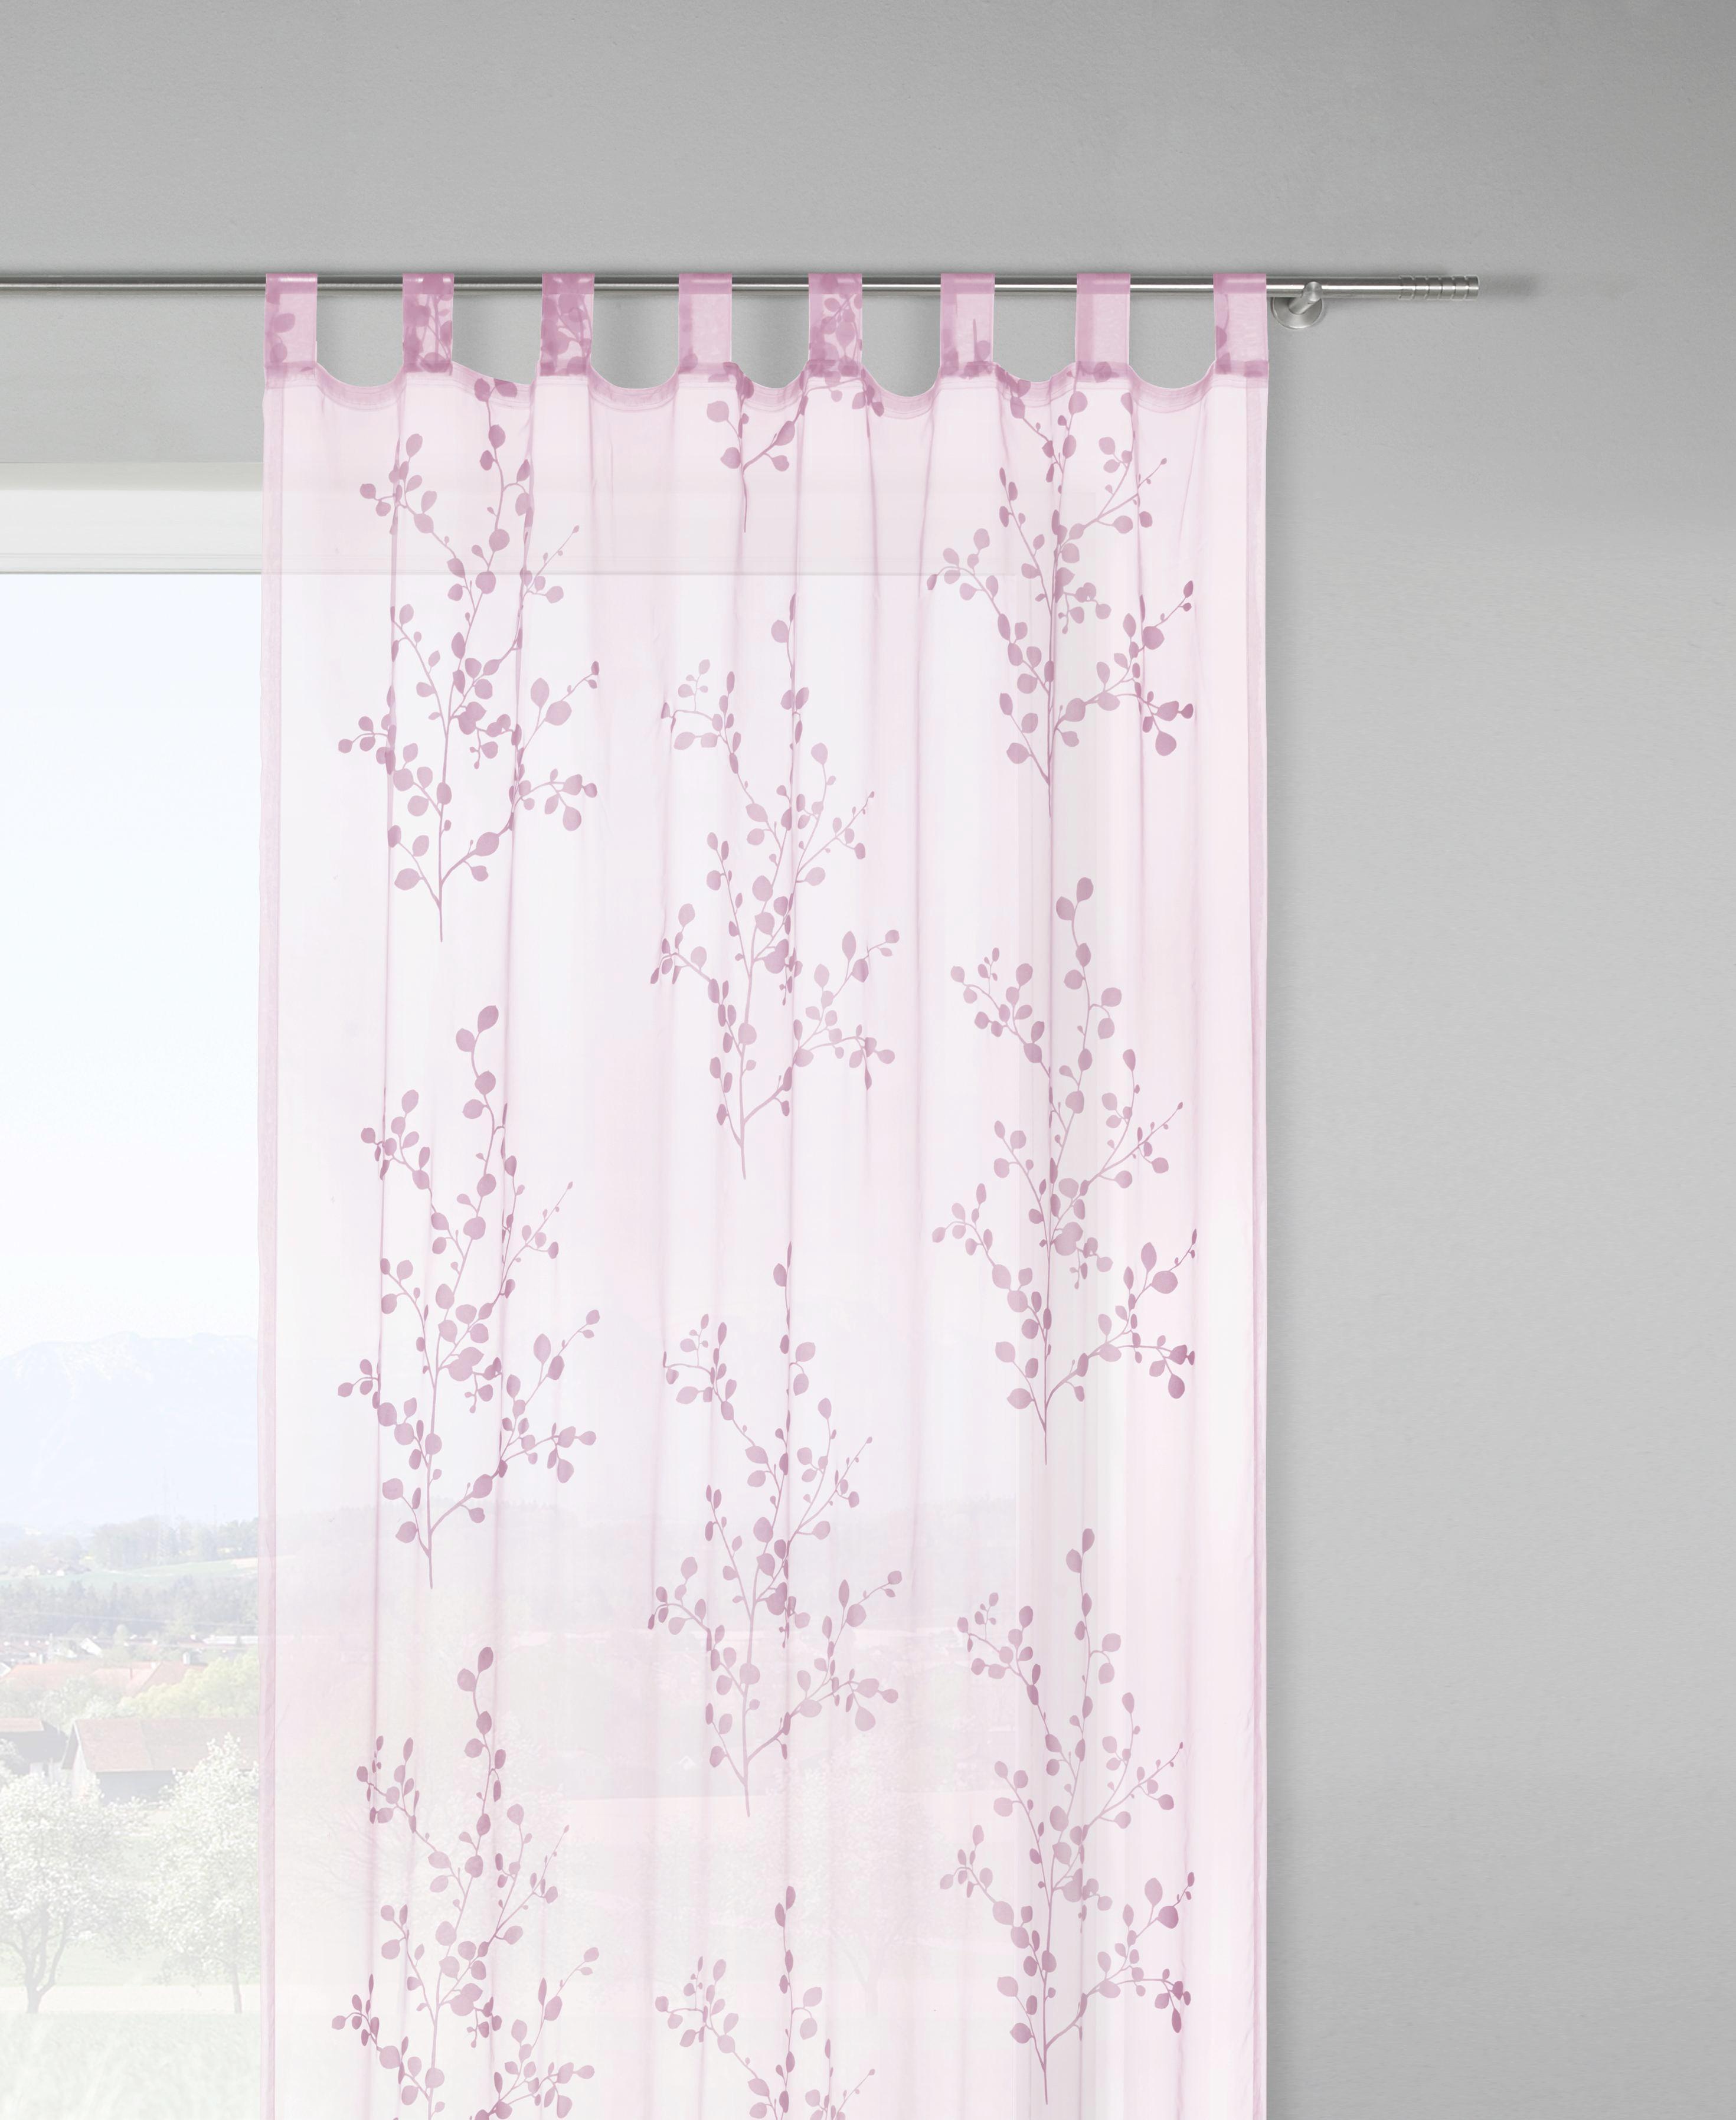 Schlaufenschal Christina, ca. 140x245cm - Rosa/Weiß, Textil (140/245cm) - MÖMAX modern living